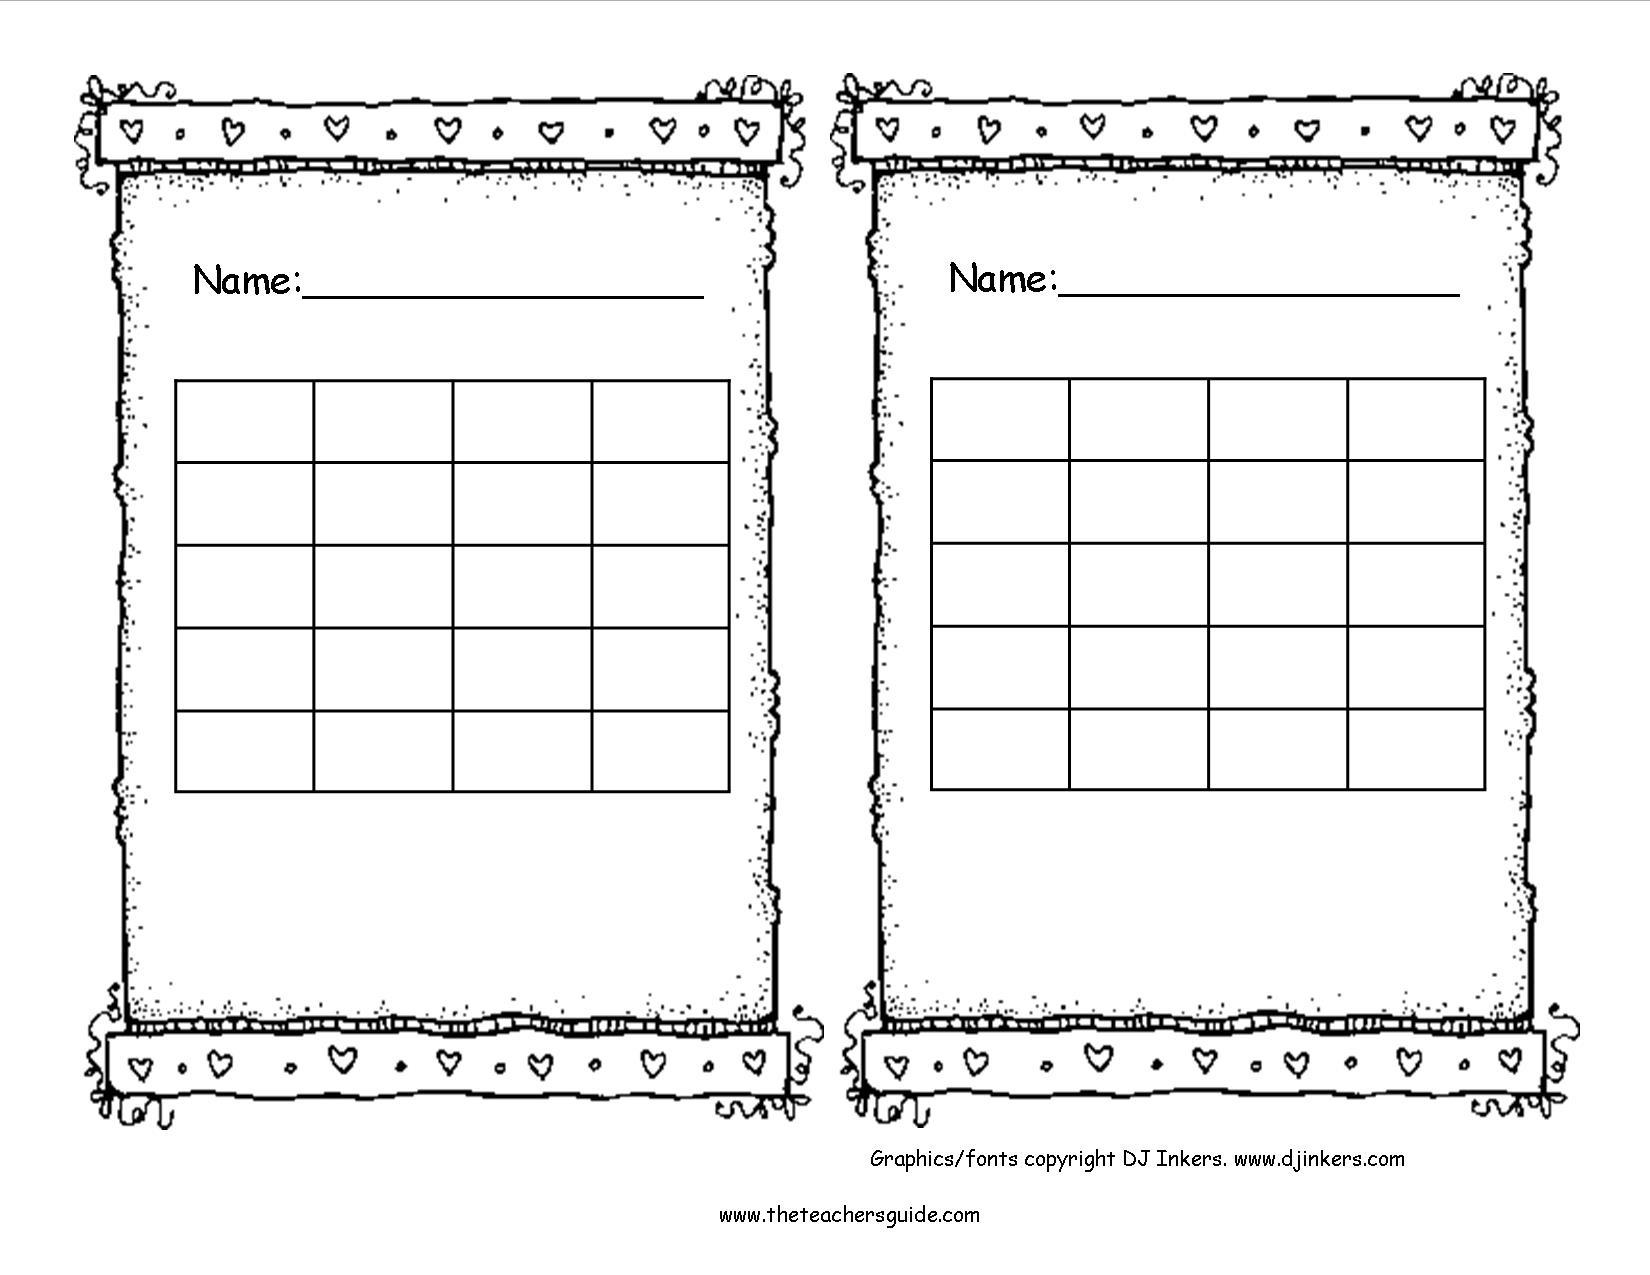 Free Printable Reward And Incentive Charts - Free Printable Sticker Charts